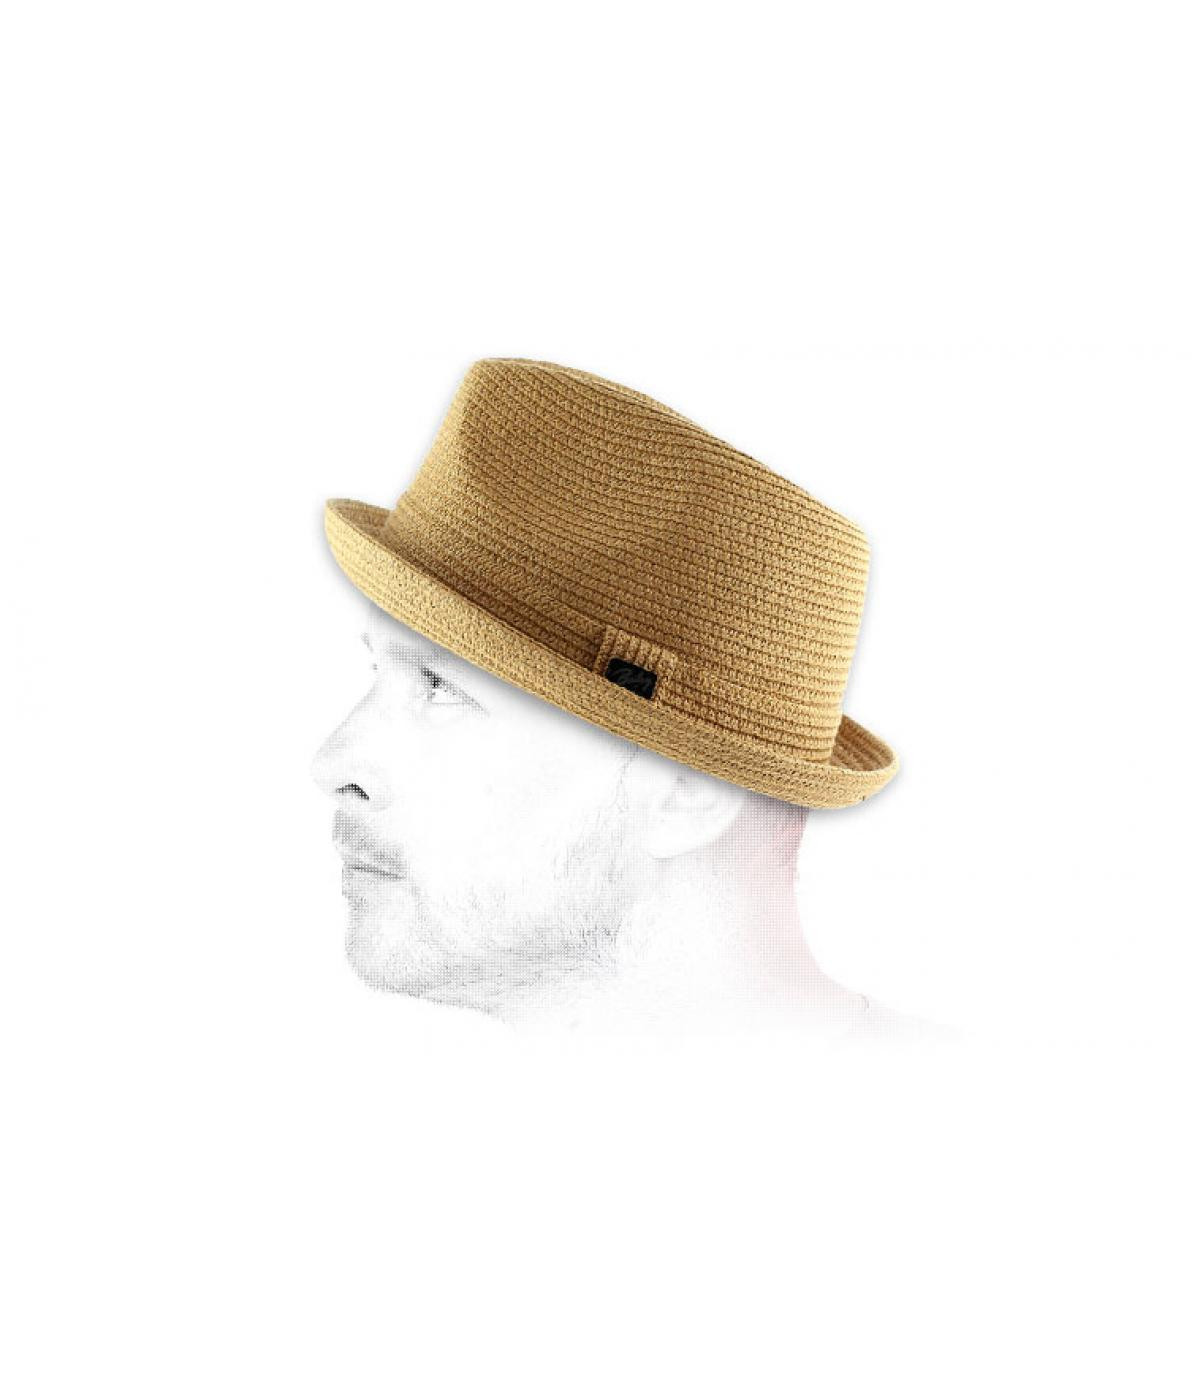 Sombrero paja trilby hombre